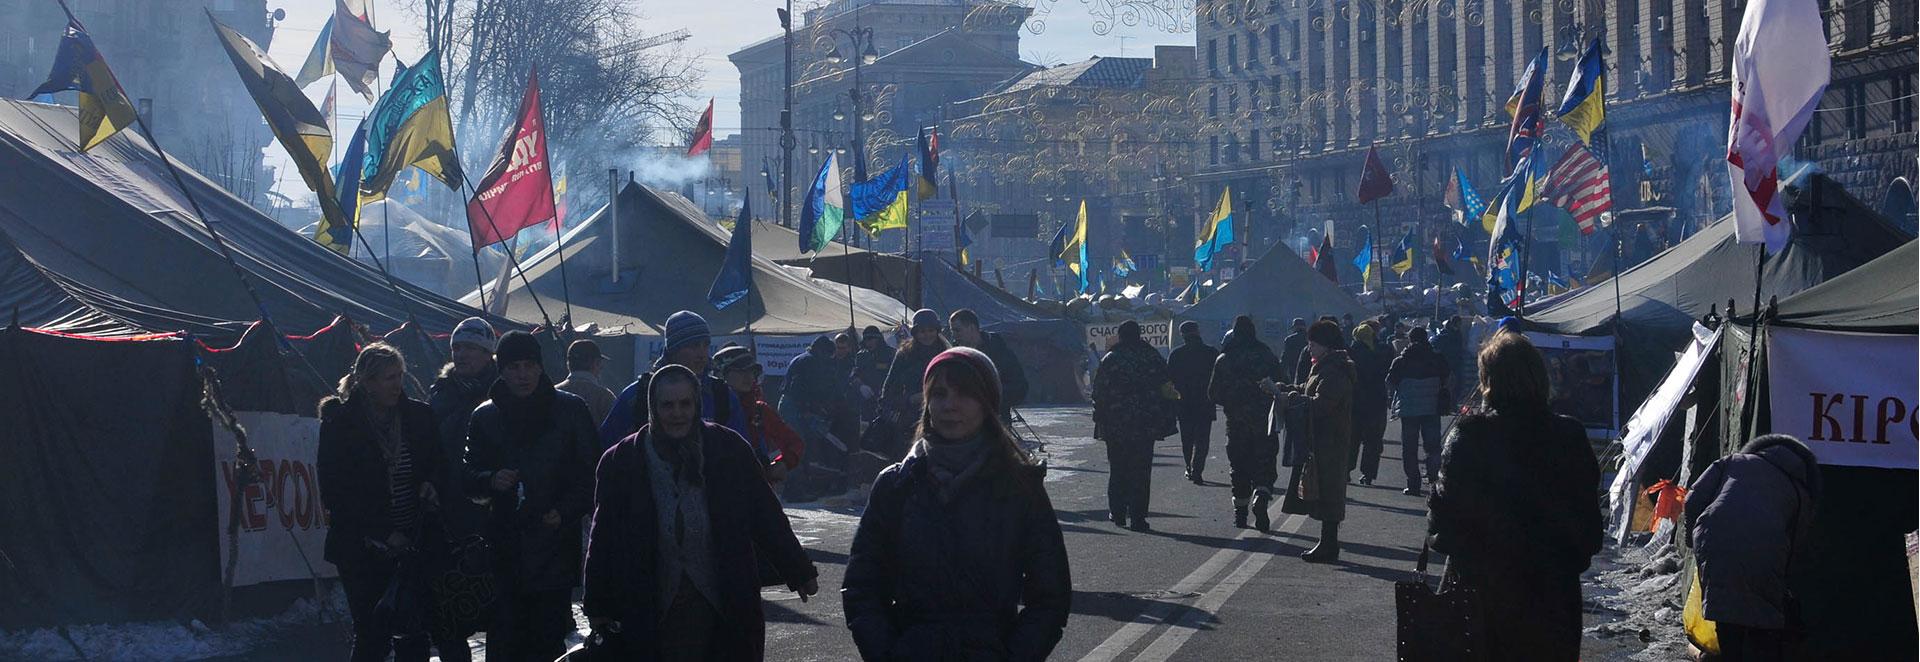 Kiev audio tour: Memories of a Revolution